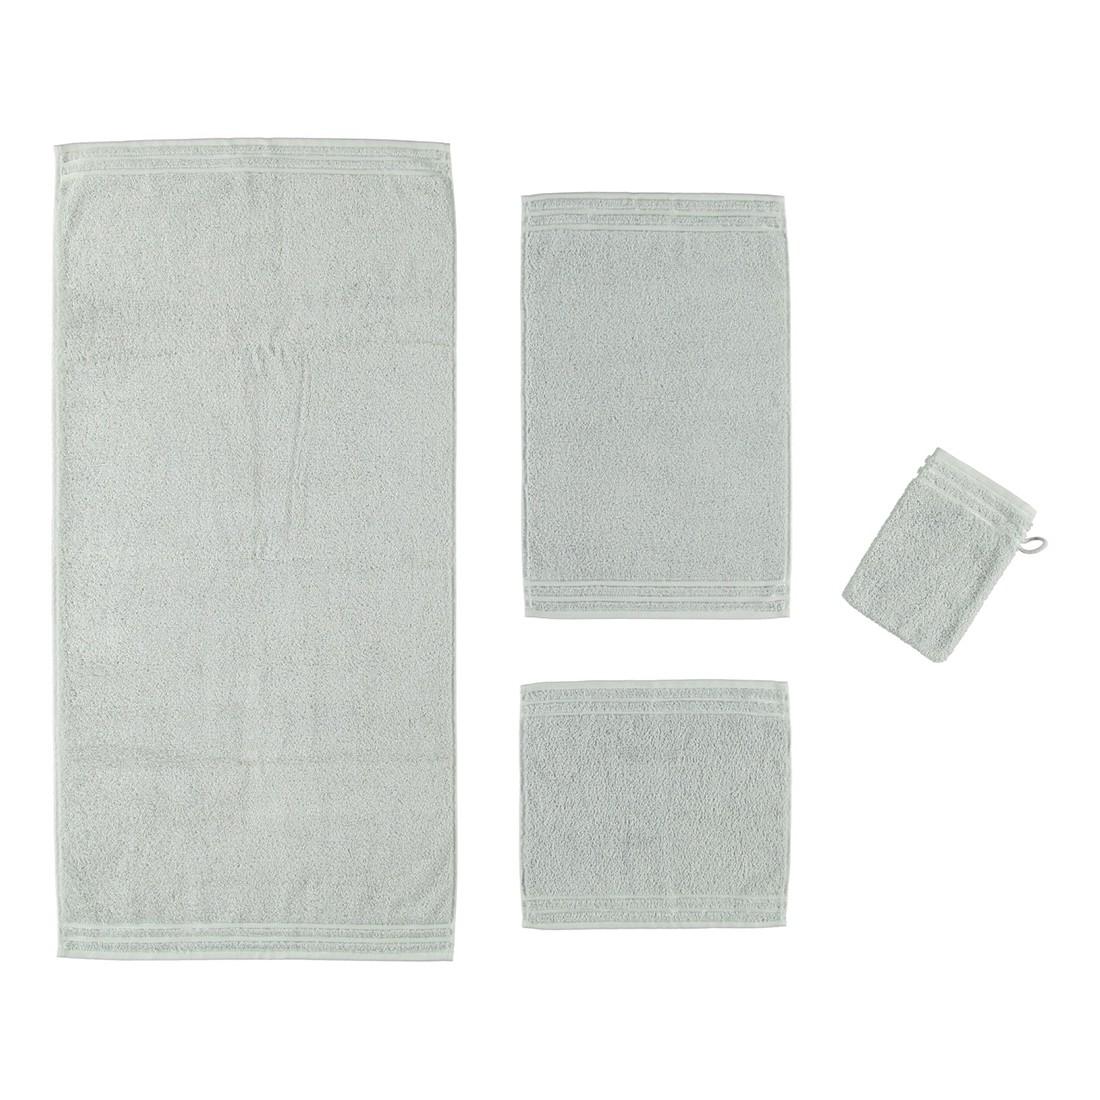 Handtuch Calypso Feeling – 100% Baumwolle light grey – 721 – Seiflappen: 30 x 30 cm, Vossen bestellen